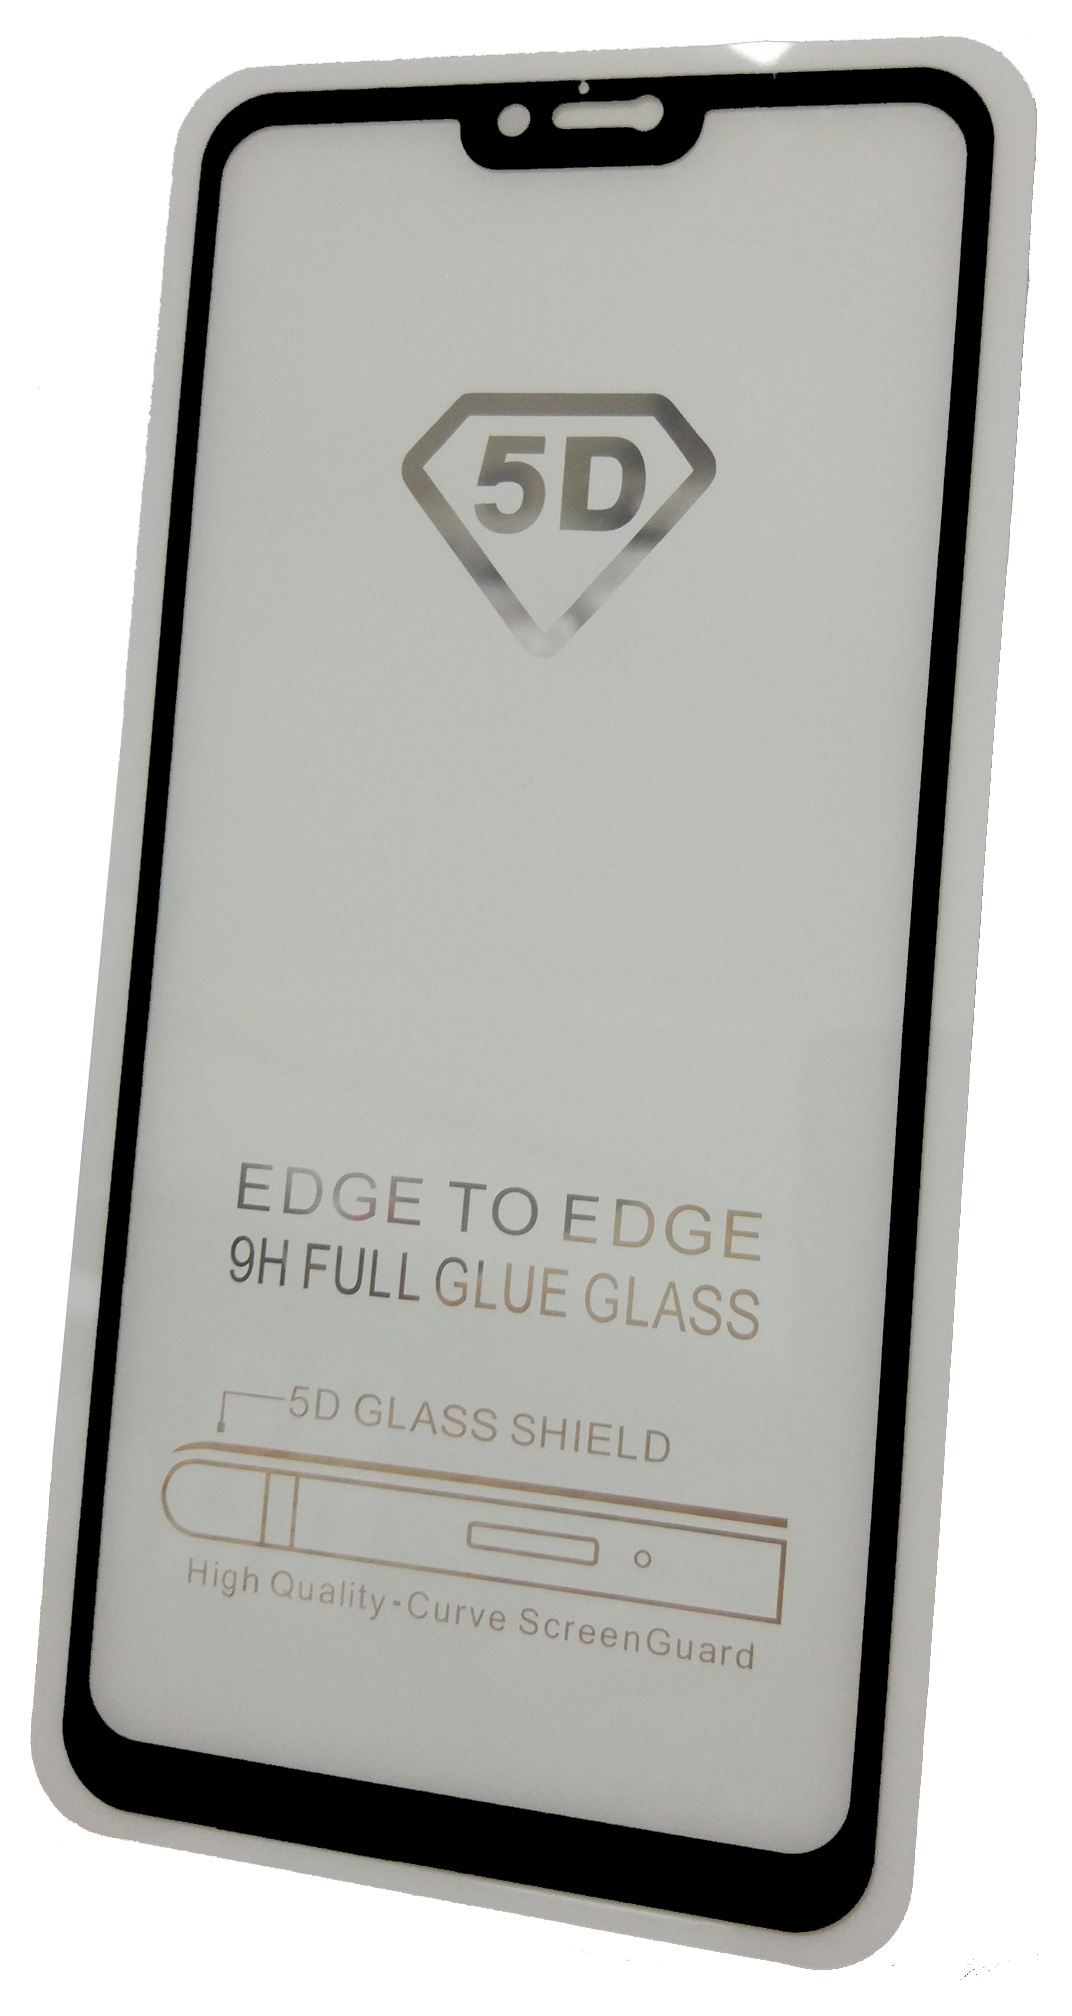 Защитное стекло Xiaomi Redmi Note 6 (Full Glue черная рамка), черный защитное стекло для xiaomi redmi 4x полная проклейка белая рамка